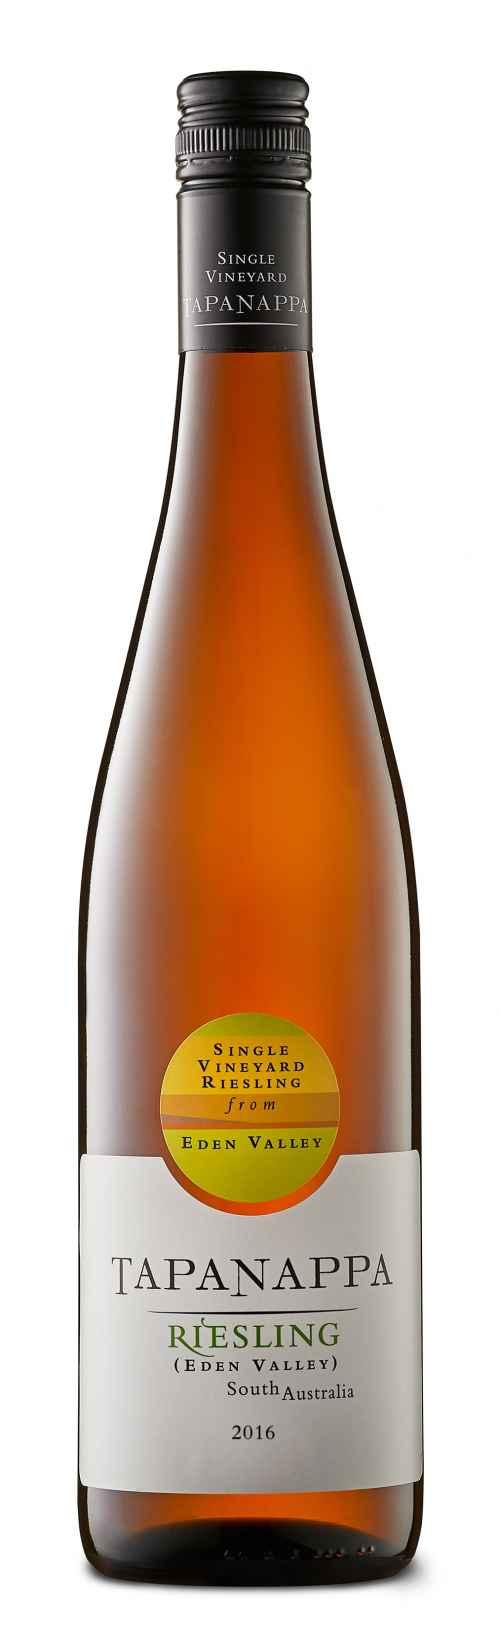 Tapanappa Eden Valley 2016 Riesling bottleshot